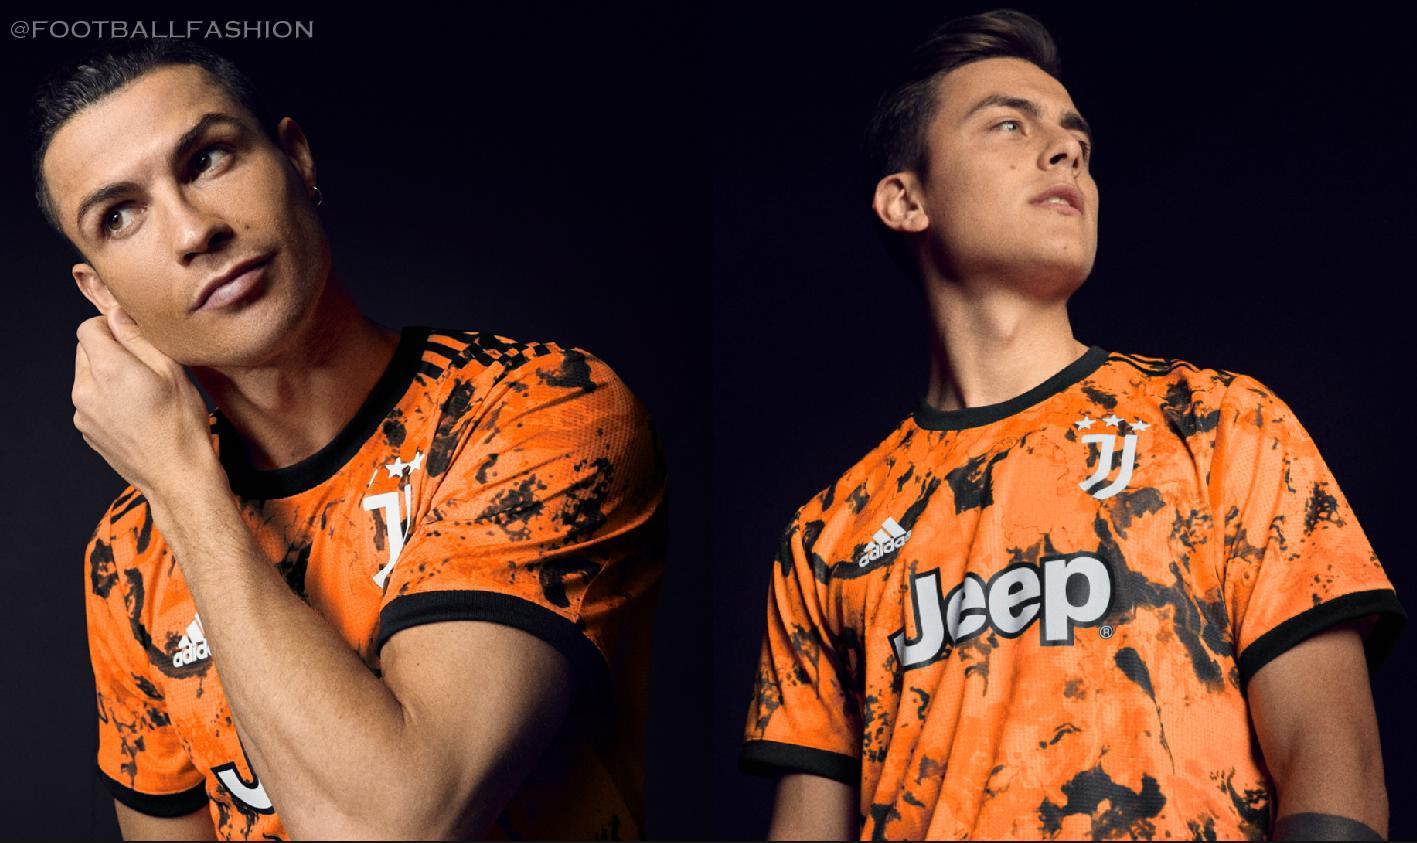 juventus fc 2020 21 adidas third kit football fashion juventus fc 2020 21 adidas third kit